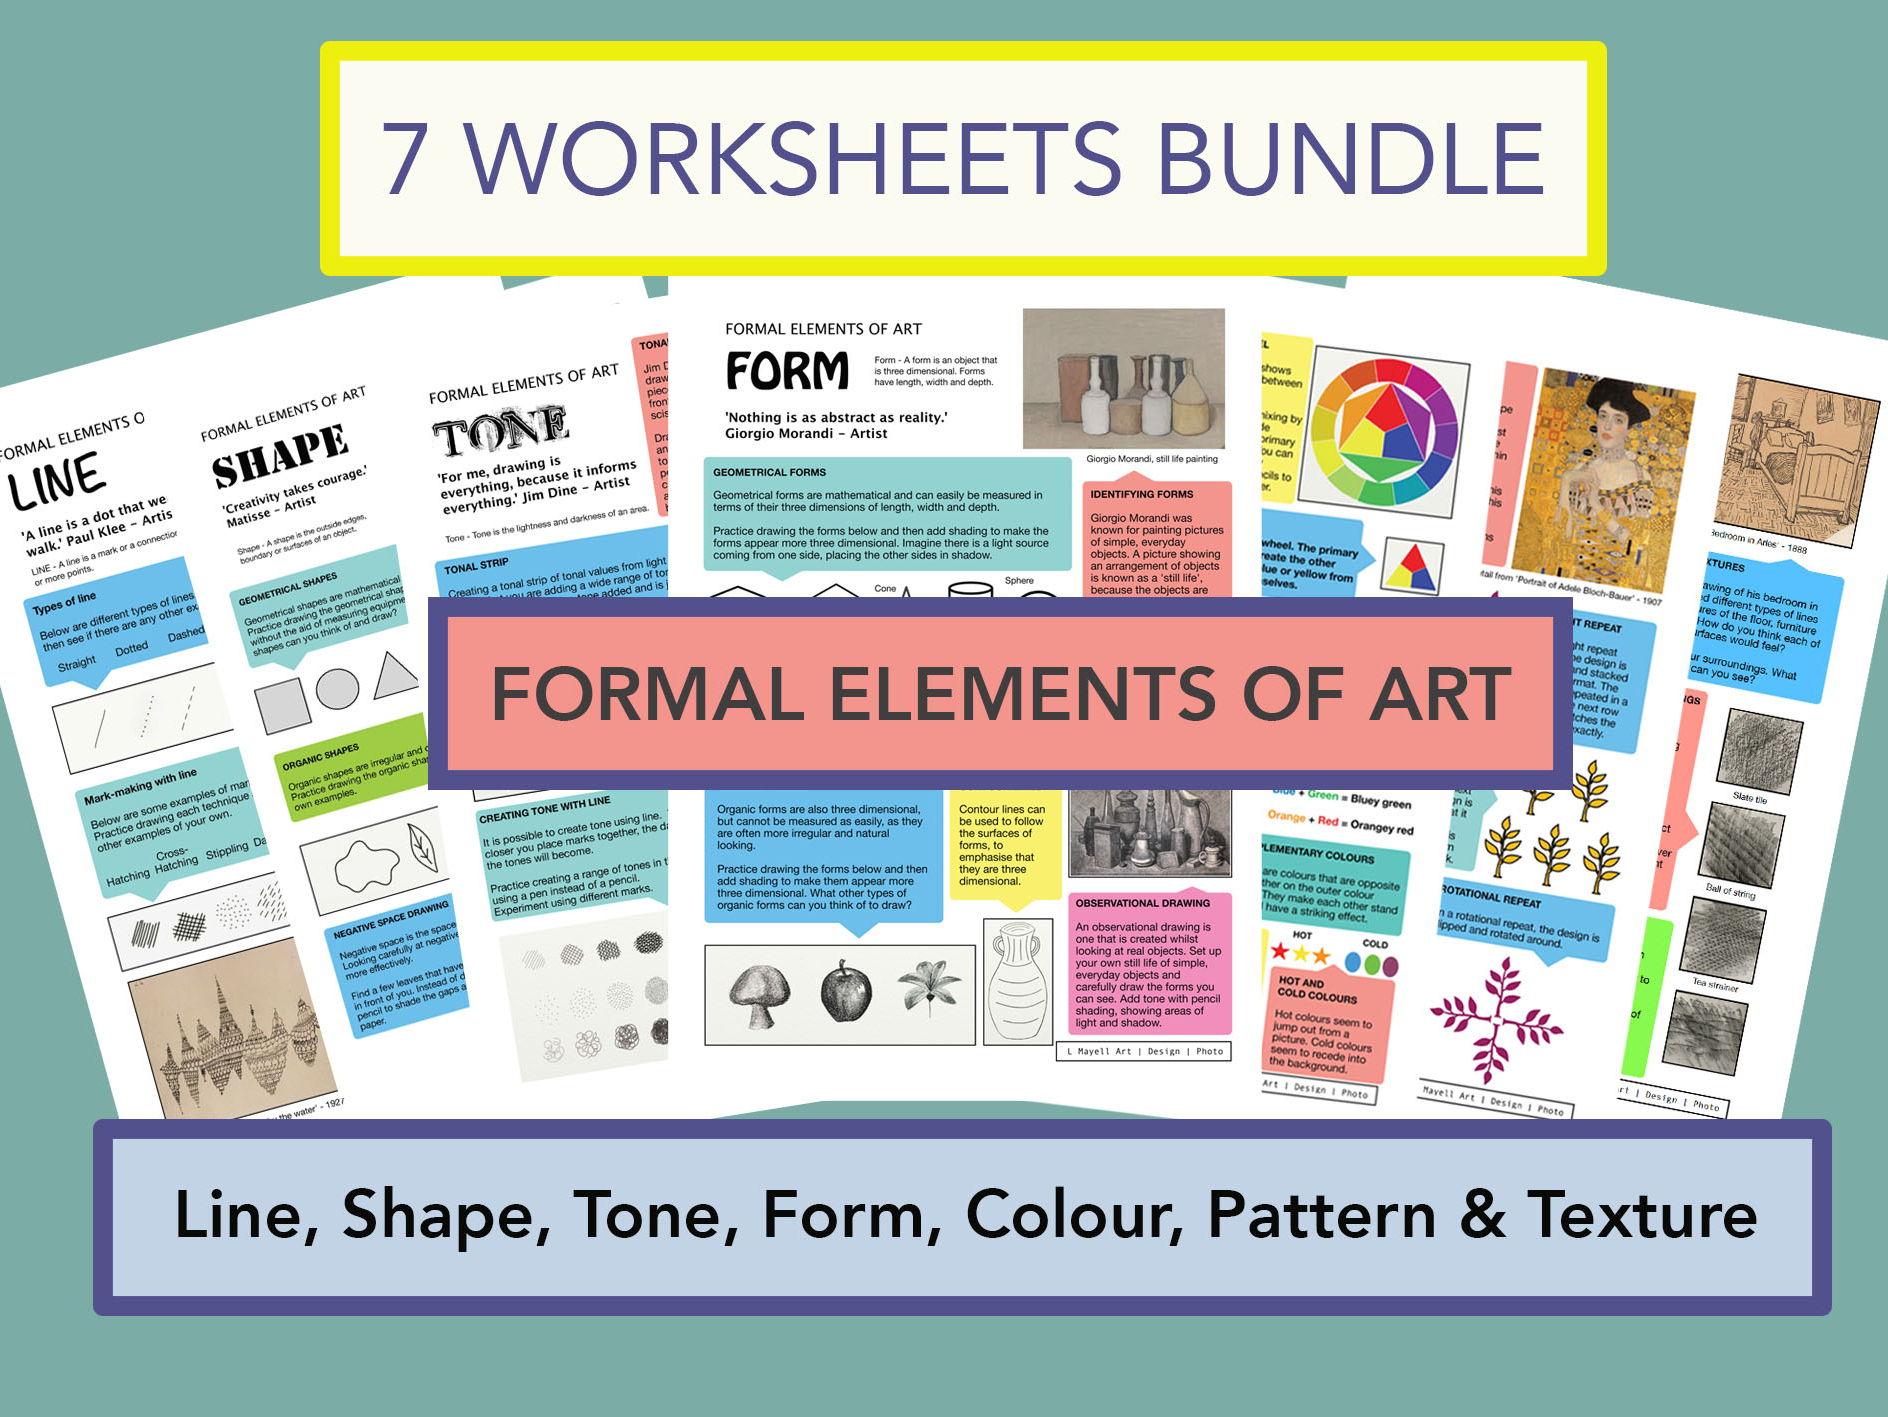 Formal Elements of Art - Full Series Bundle